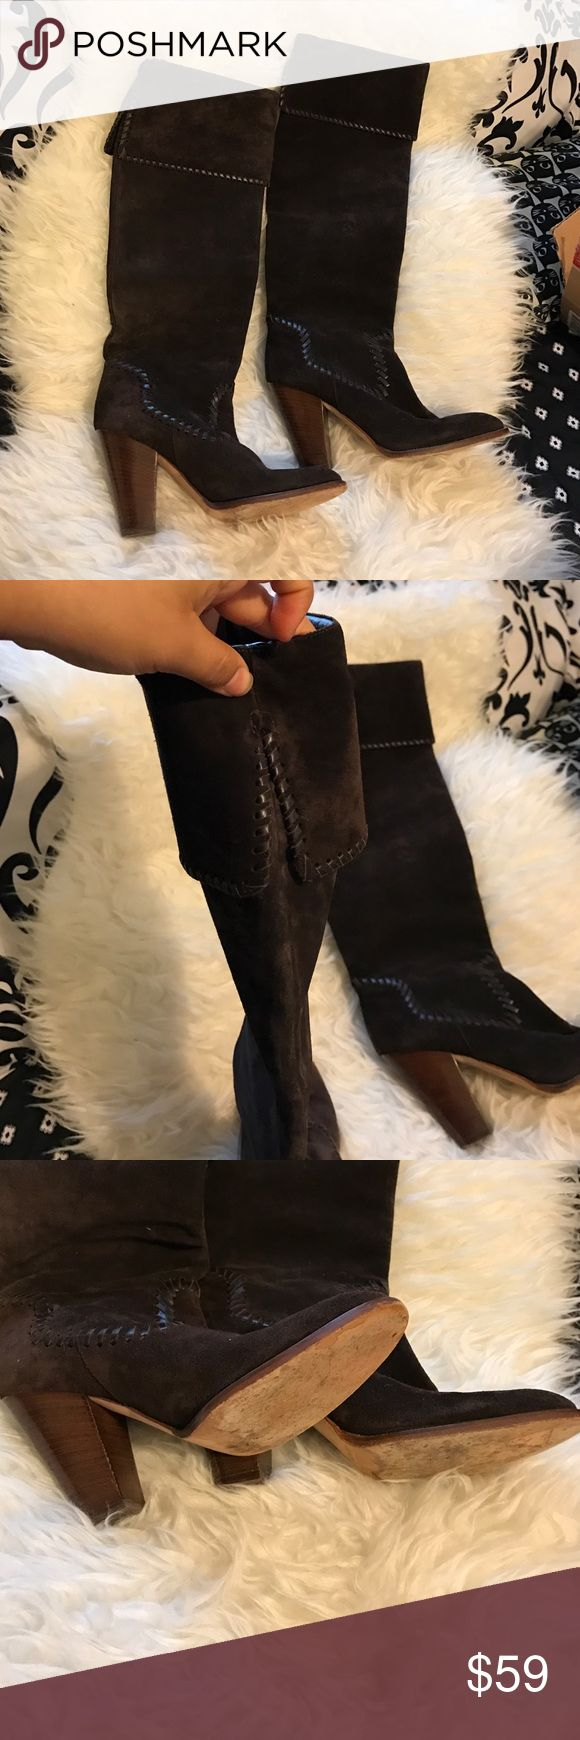 Mk boots Mk boots Michael Kors Shoes